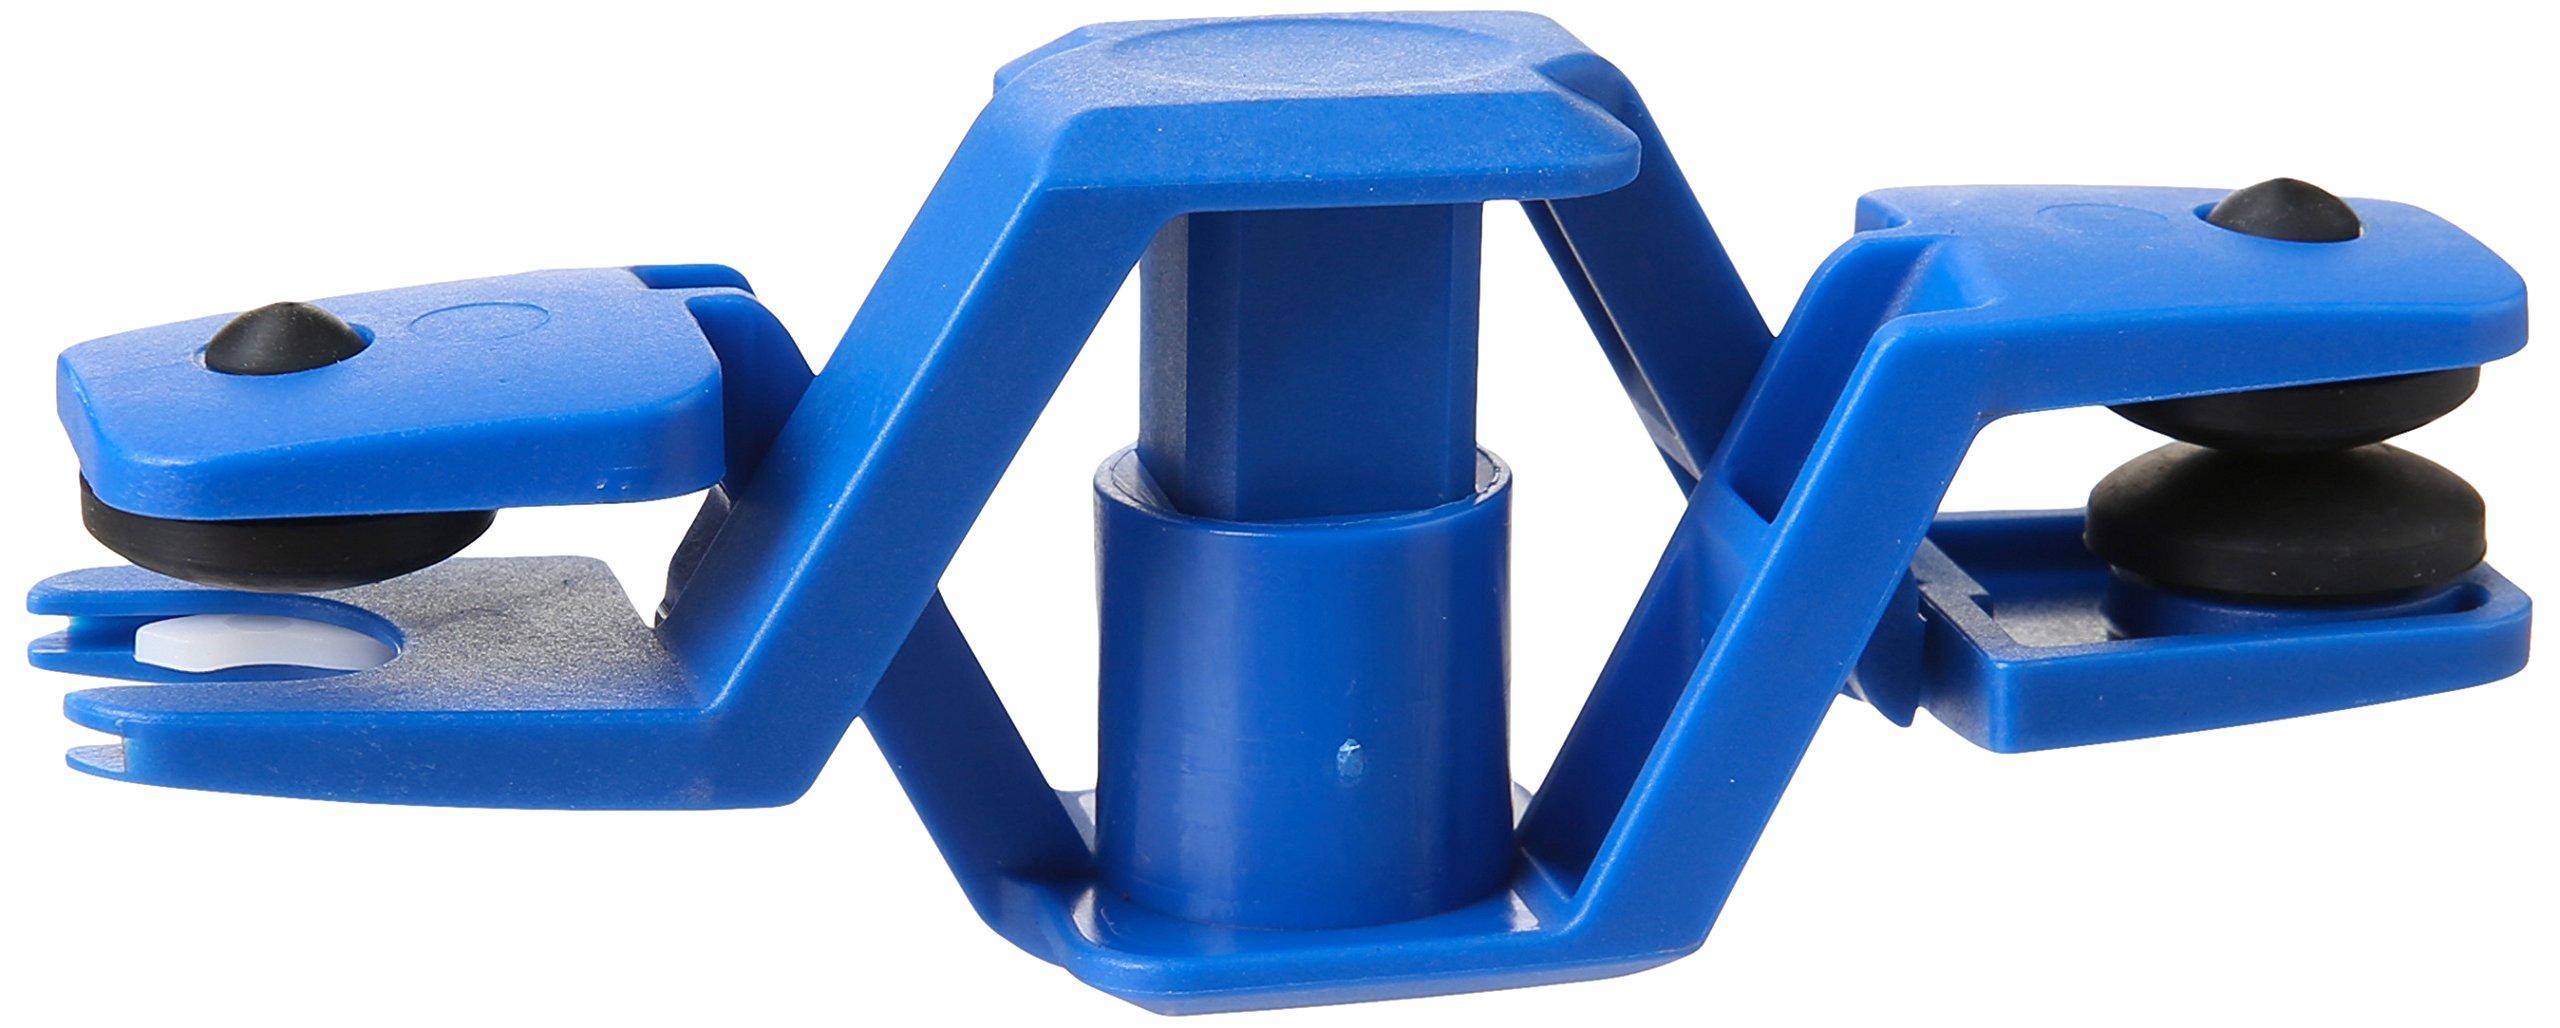 CTA Tools 3490 Steel Line Stopper Set, 2-Piece